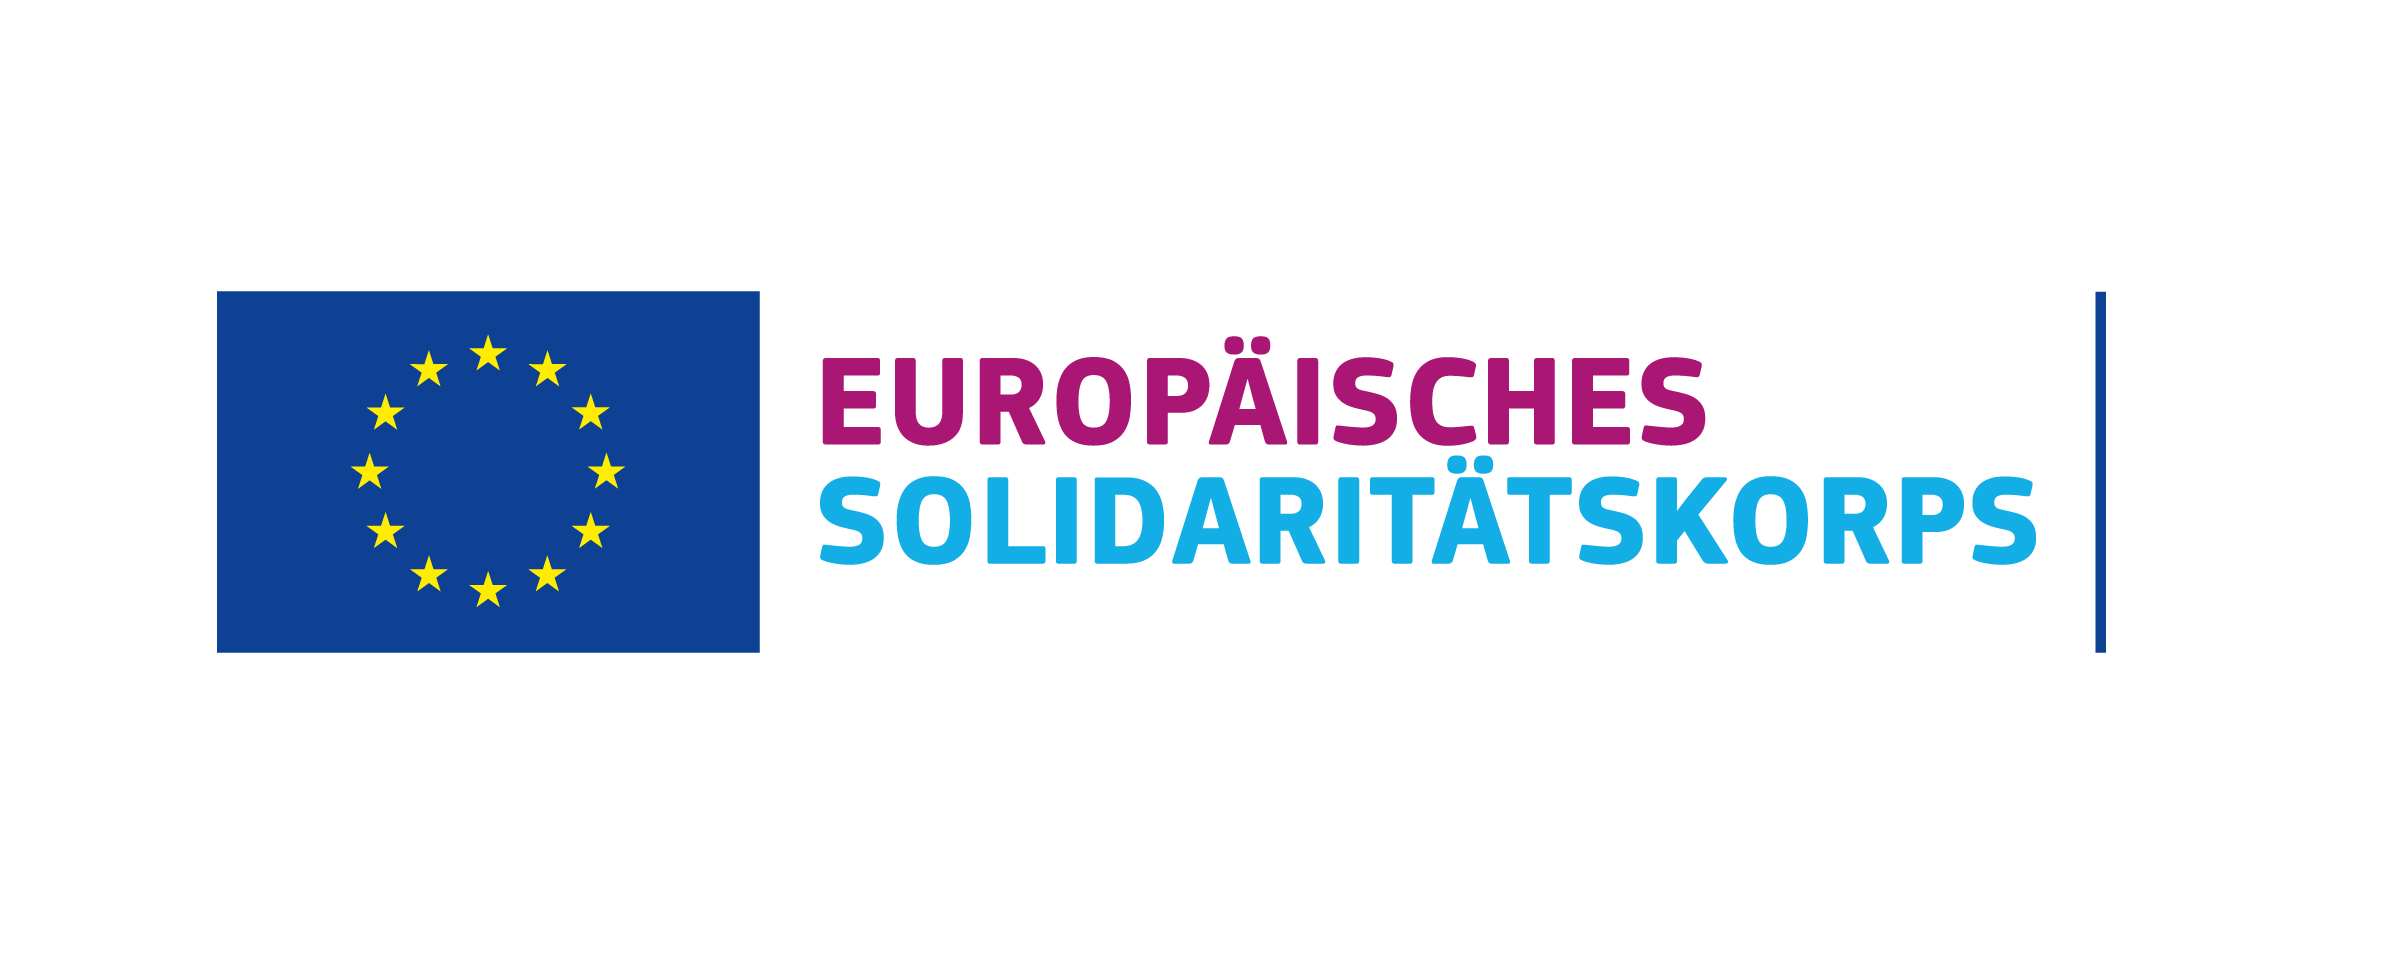 Neues EU-Programm: Solidaritätskorps